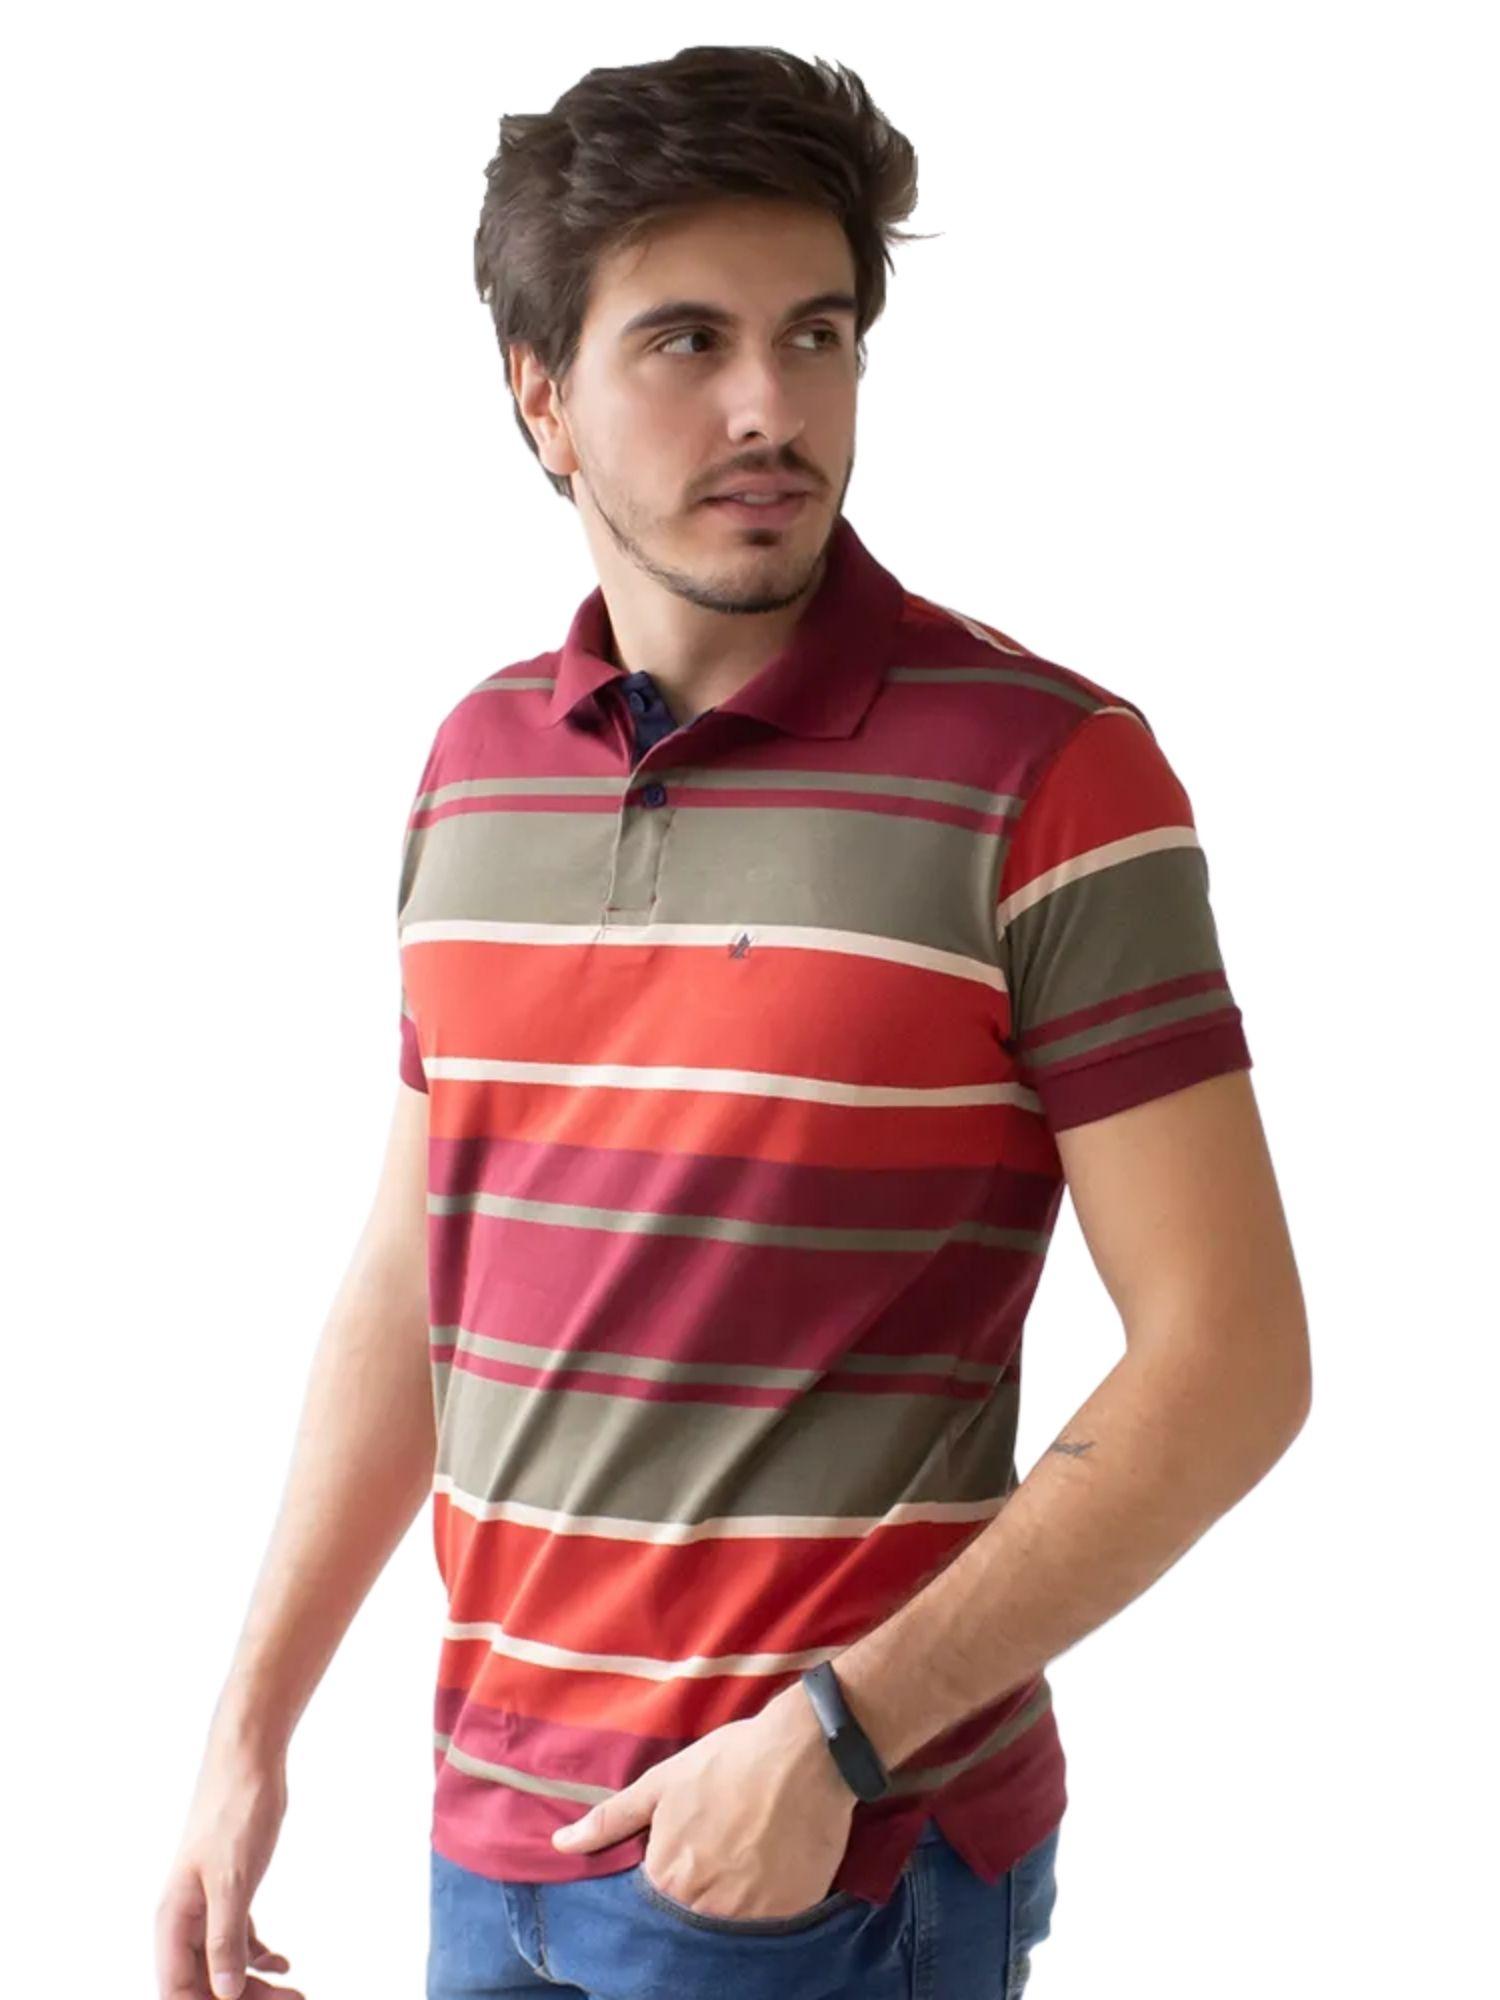 Camiseta Polo Listrada Anticorpus  52225